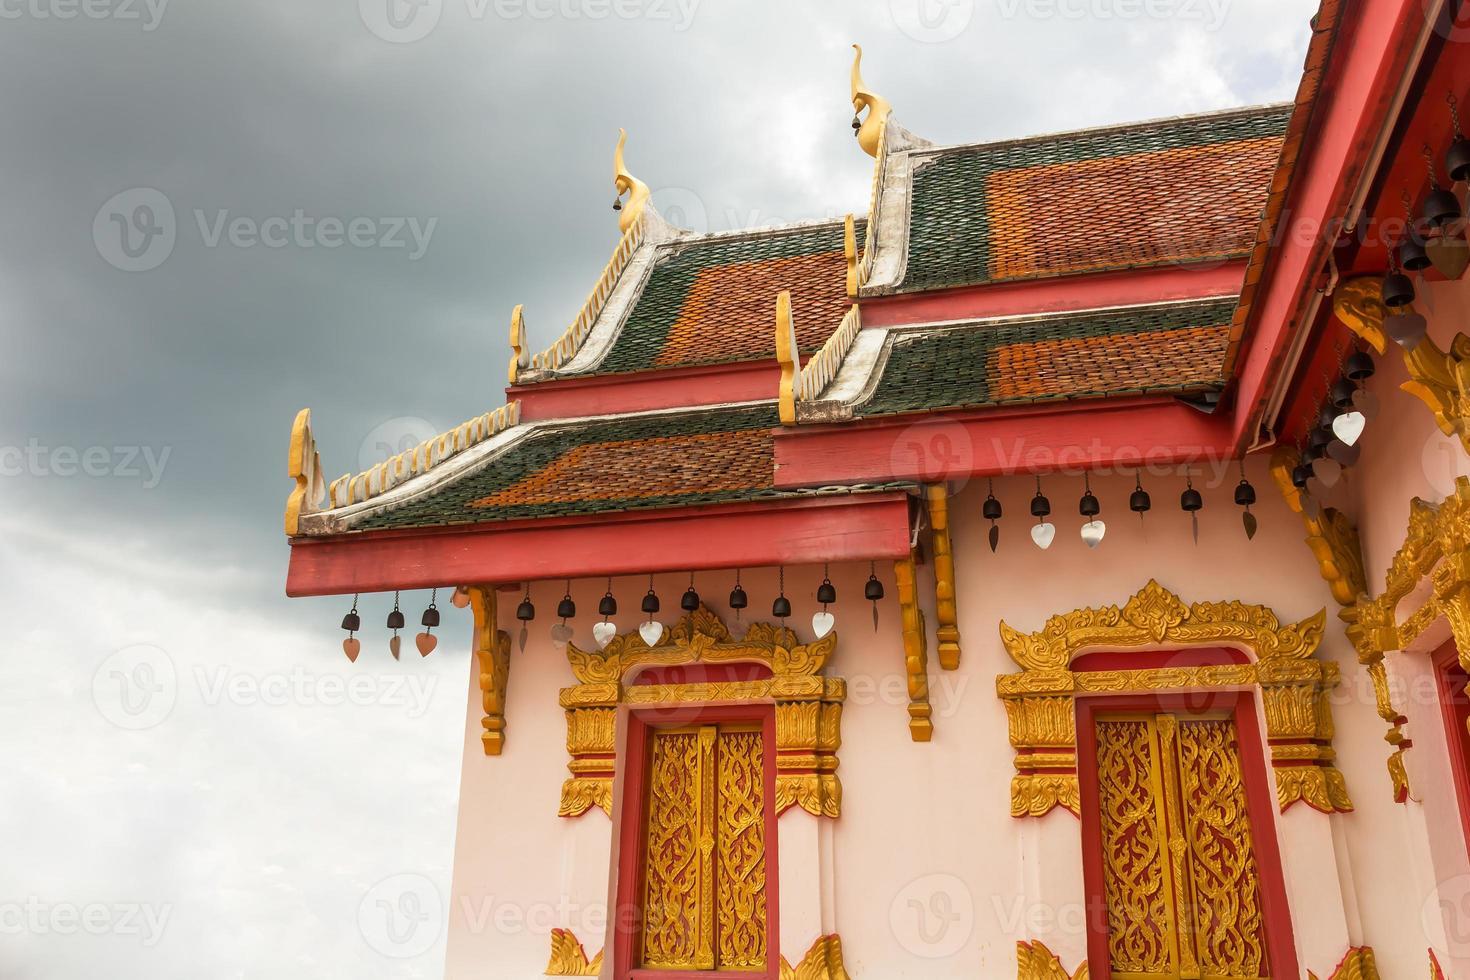 arkitektur i buddhism och mulen dag foto